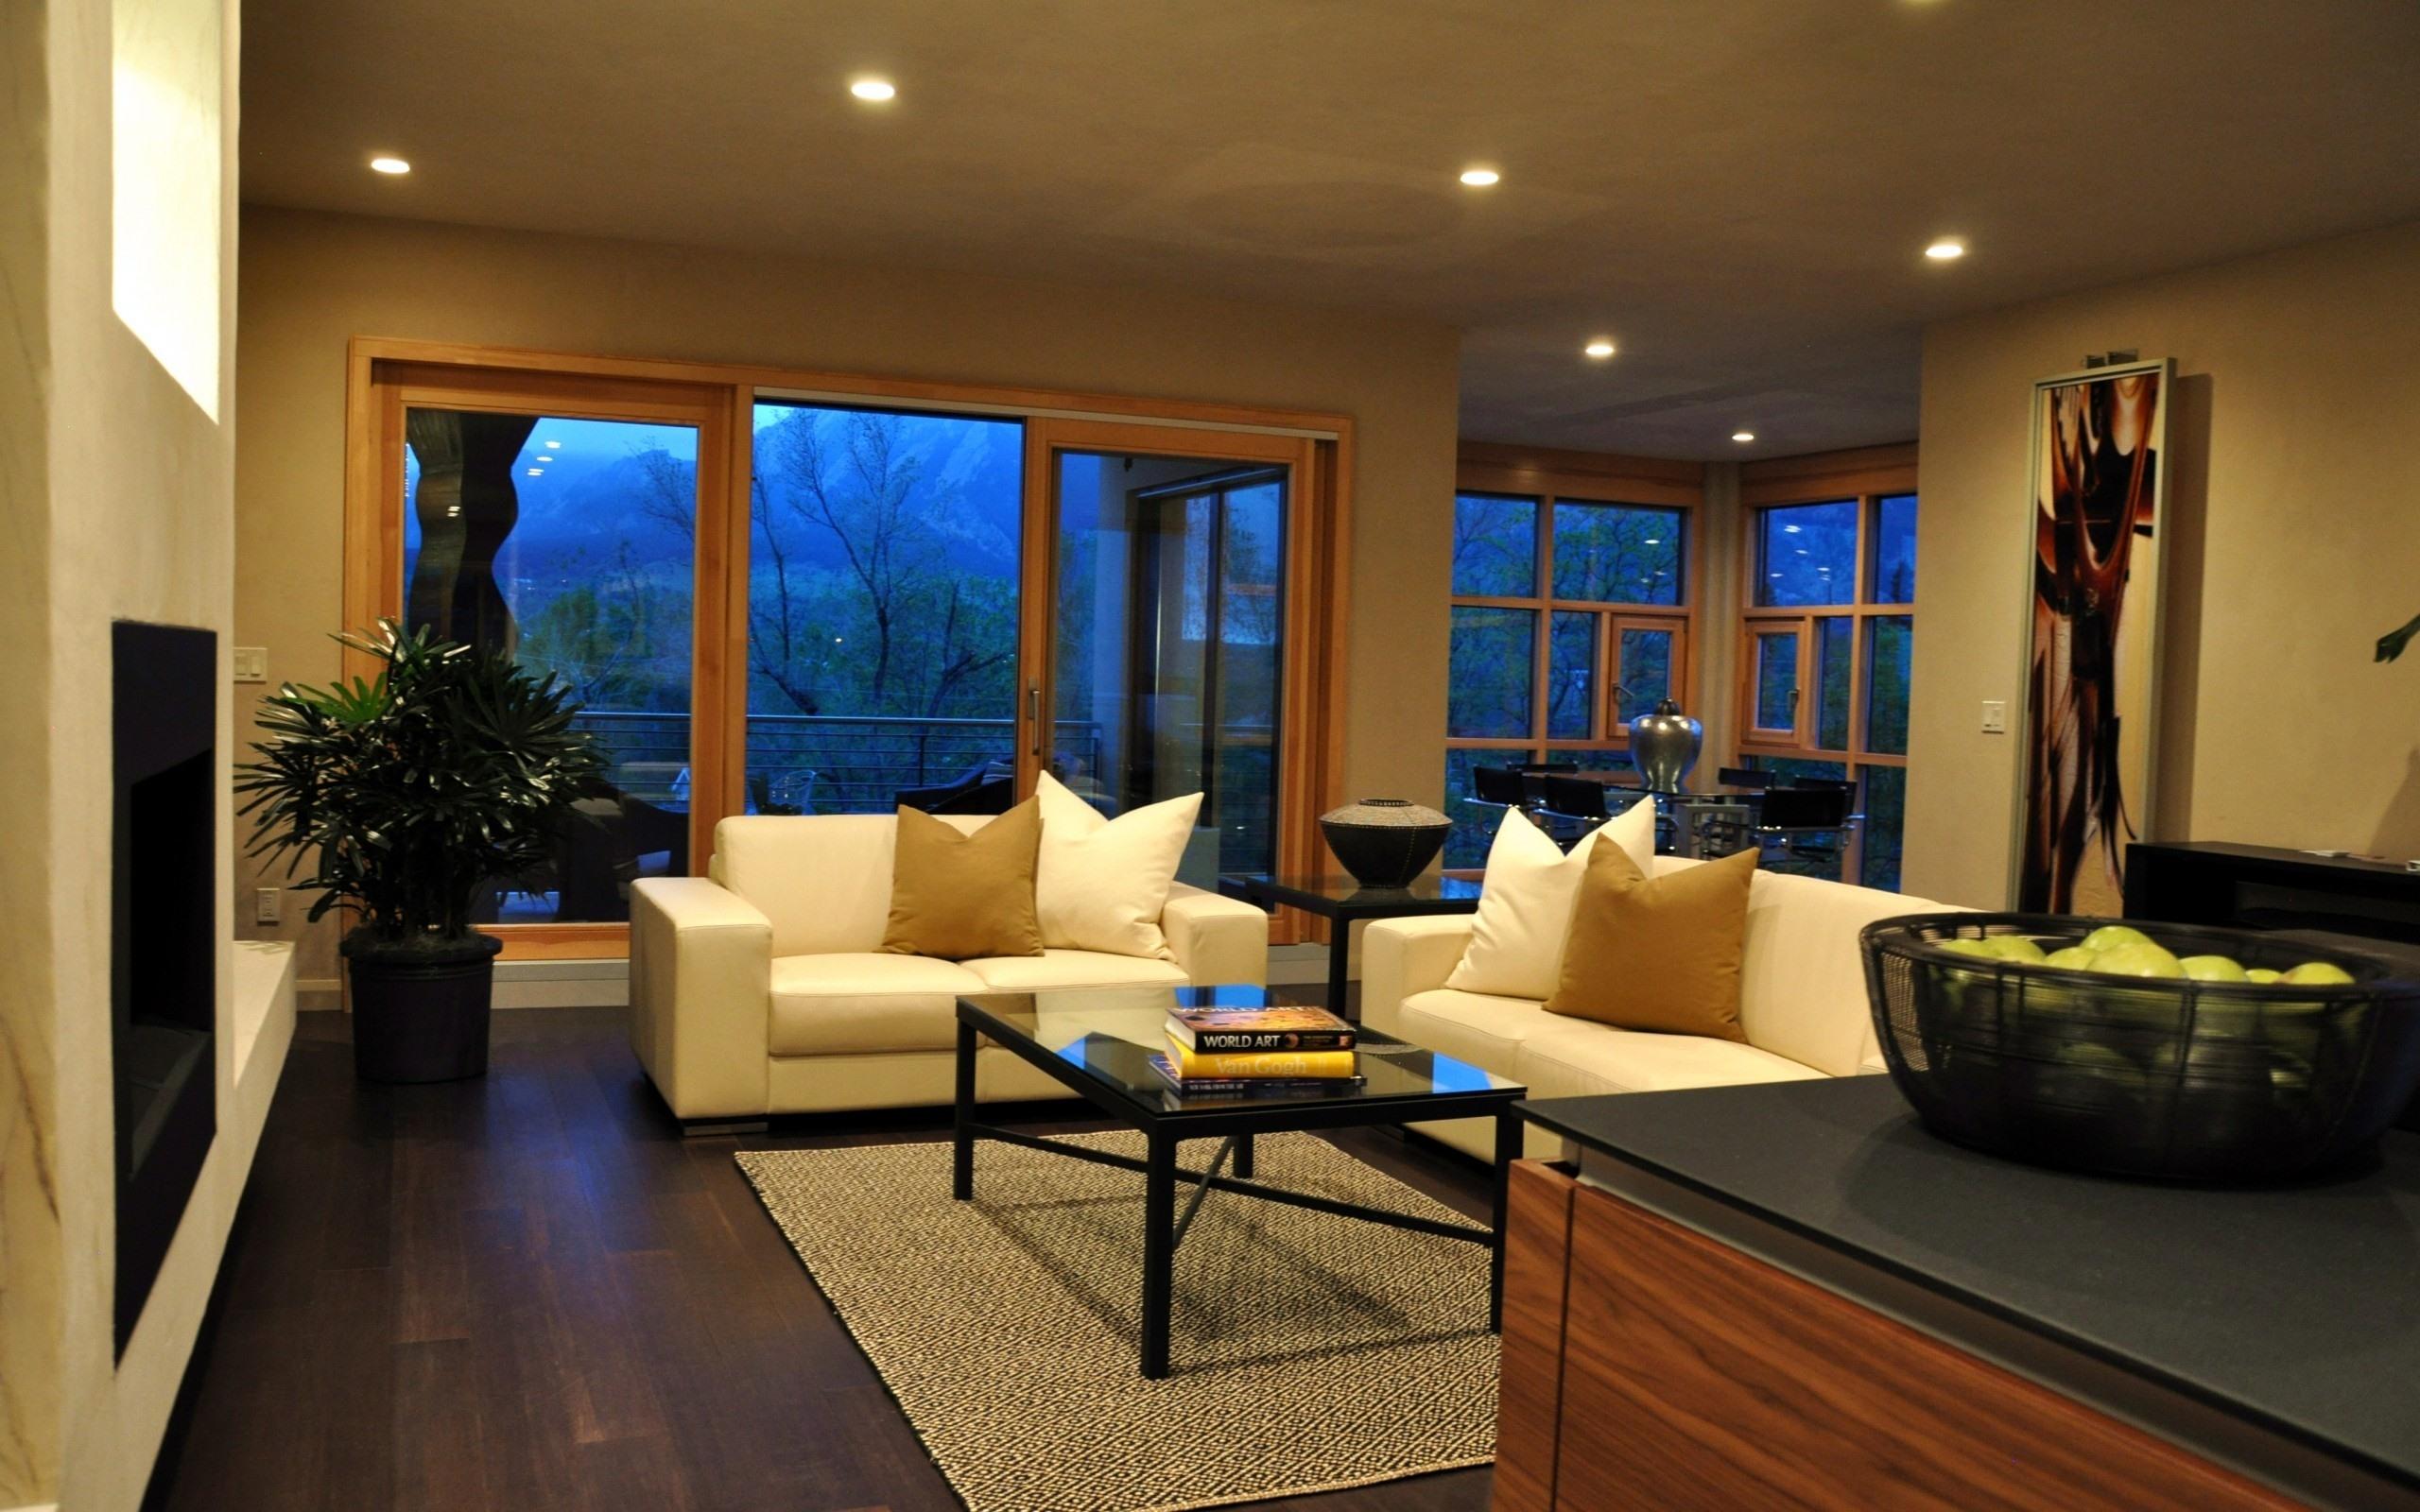 ArtStation - living room, interior, night scene , Joe Matteis